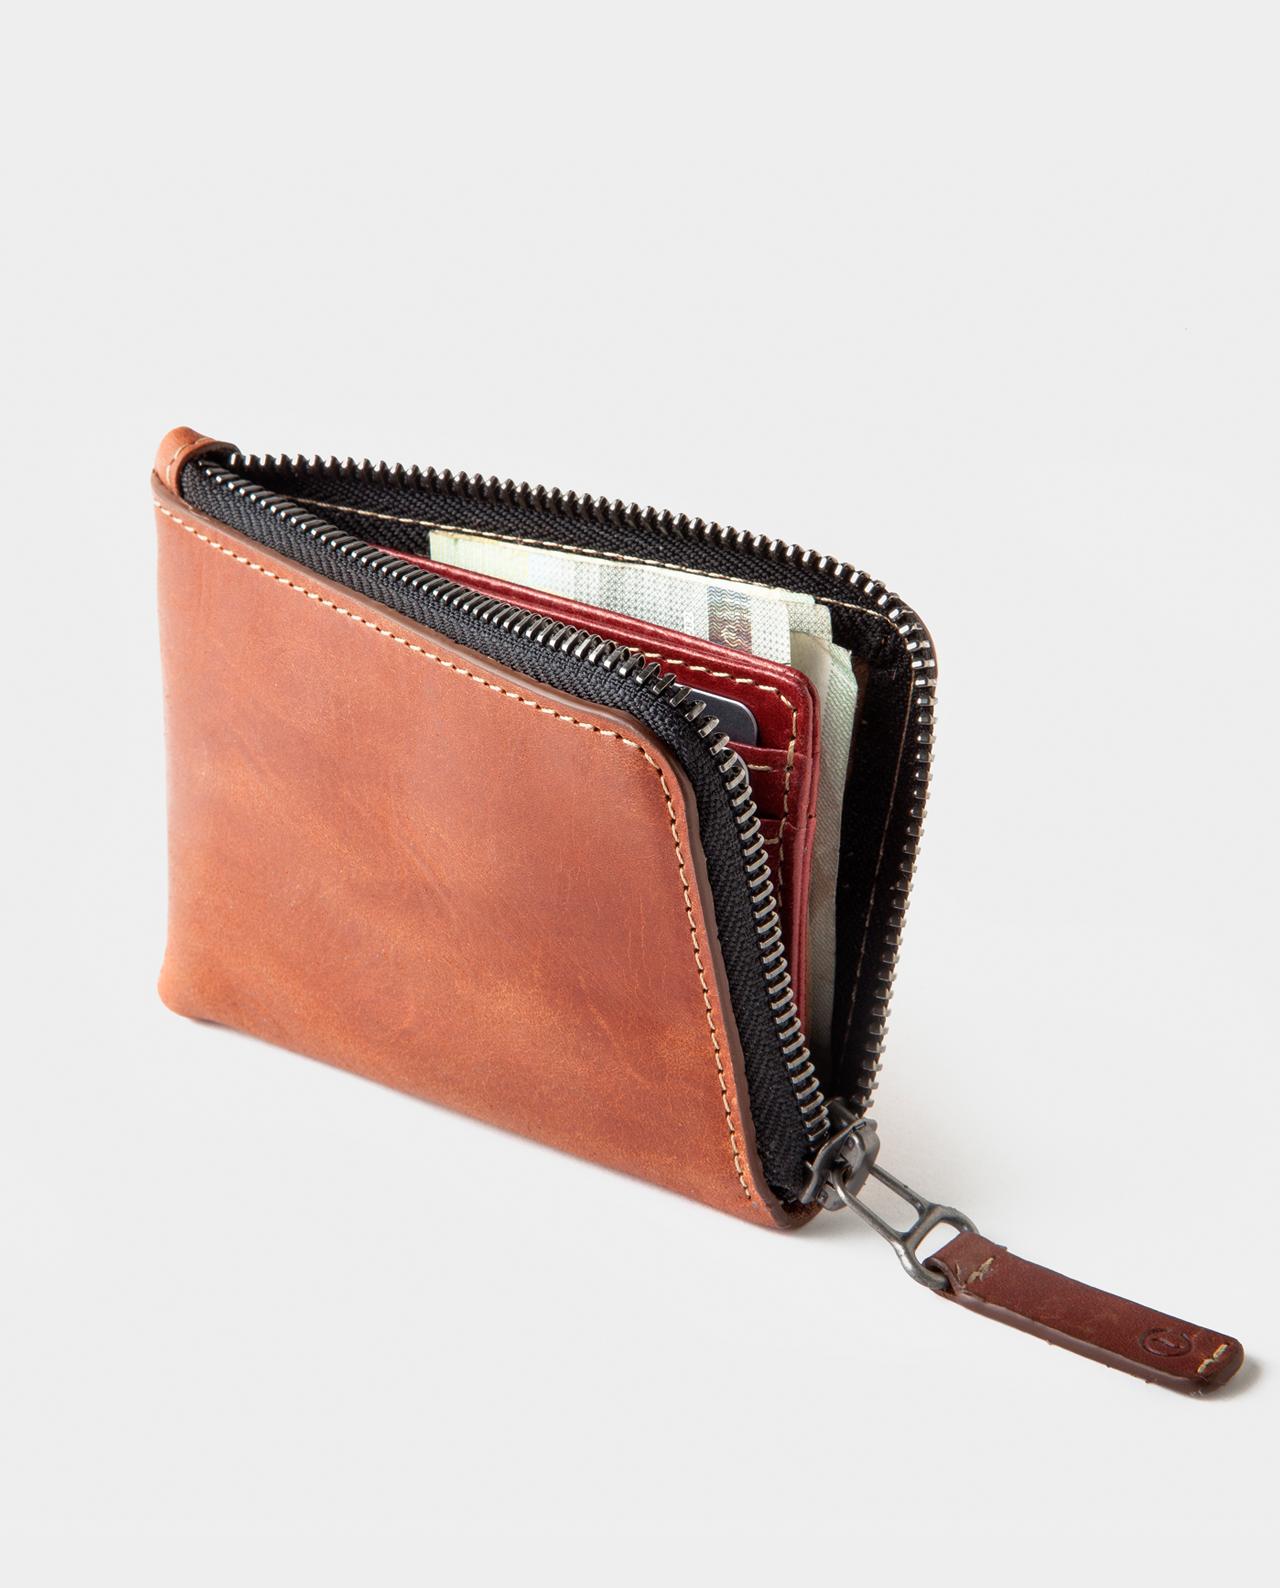 Osaka Zip Wallet Roasted | Handcrafted in Spain | CAFÉ